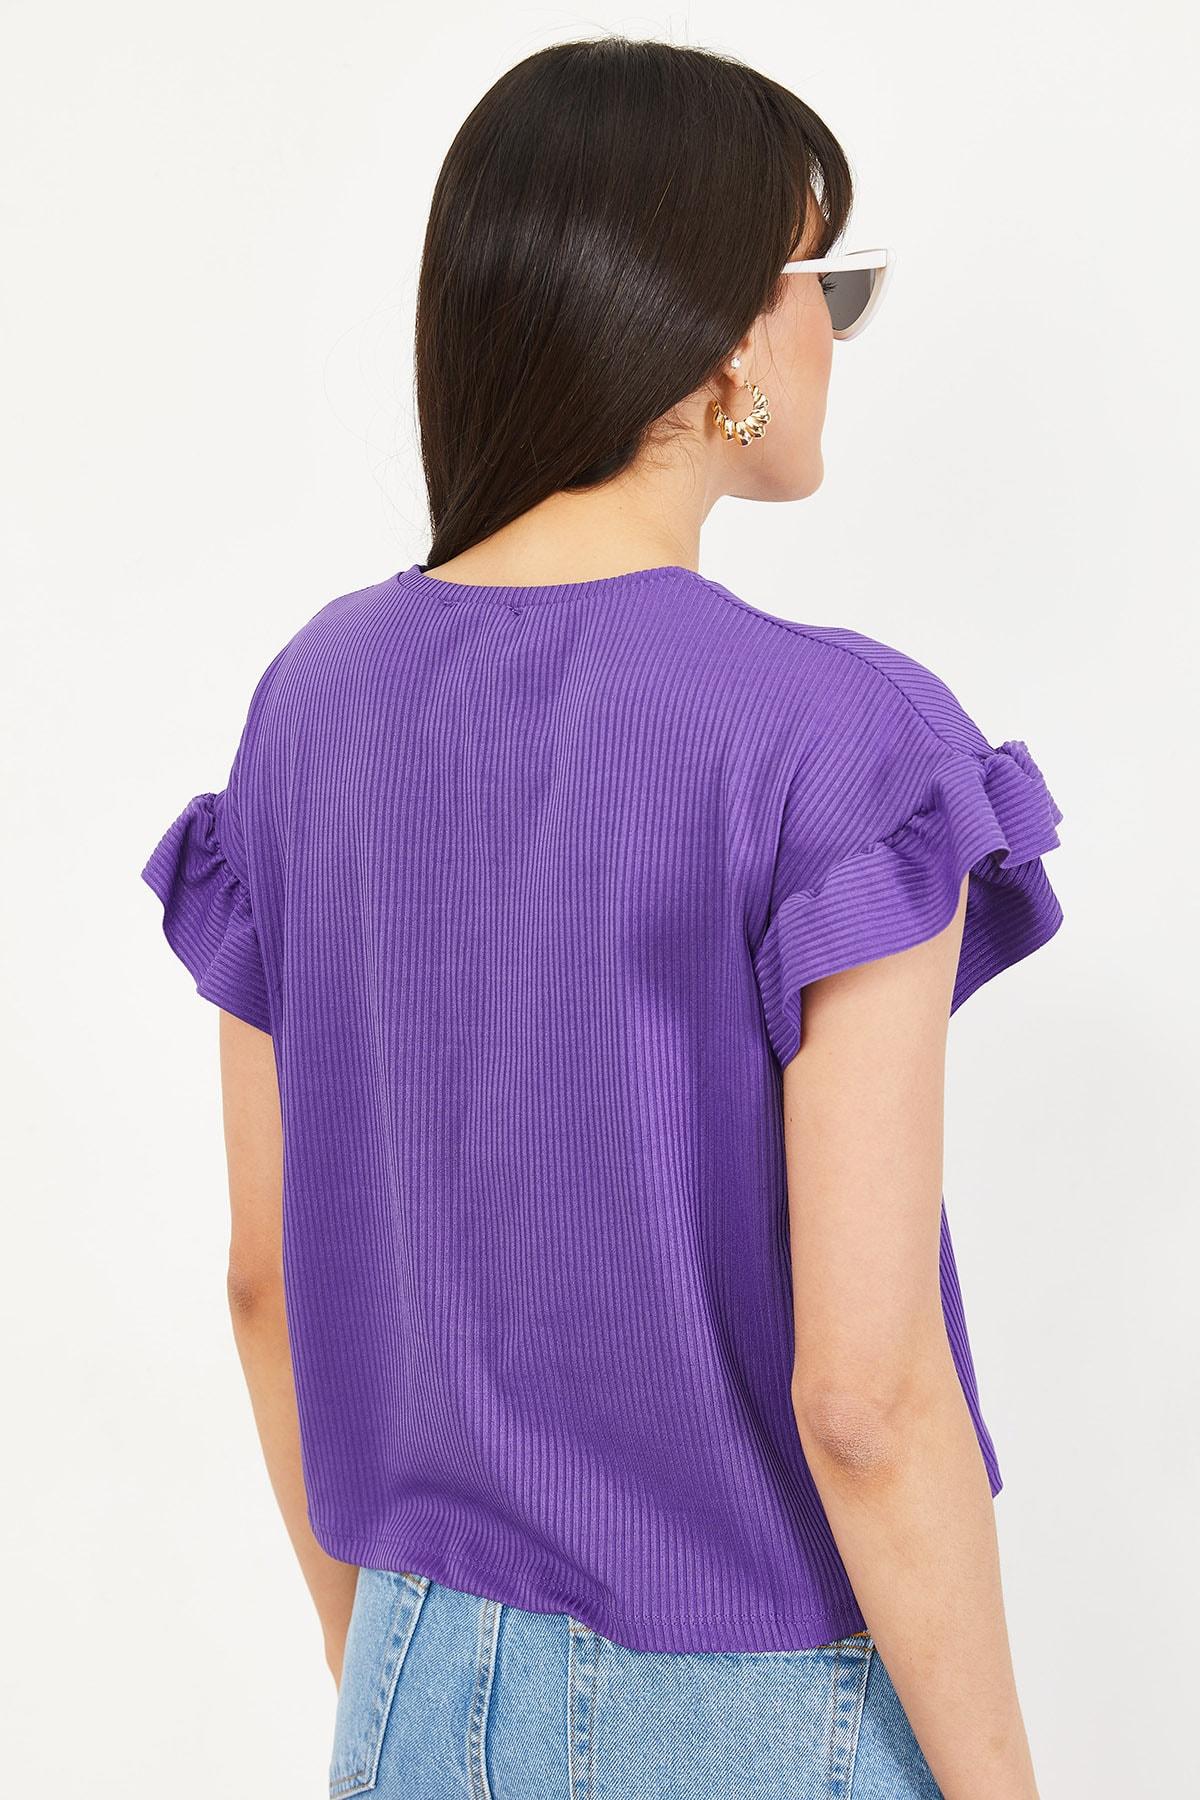 Bianco Lucci Kadın Mor Kolu Fırfırlı Kaşkorse Bluz 10051015 4